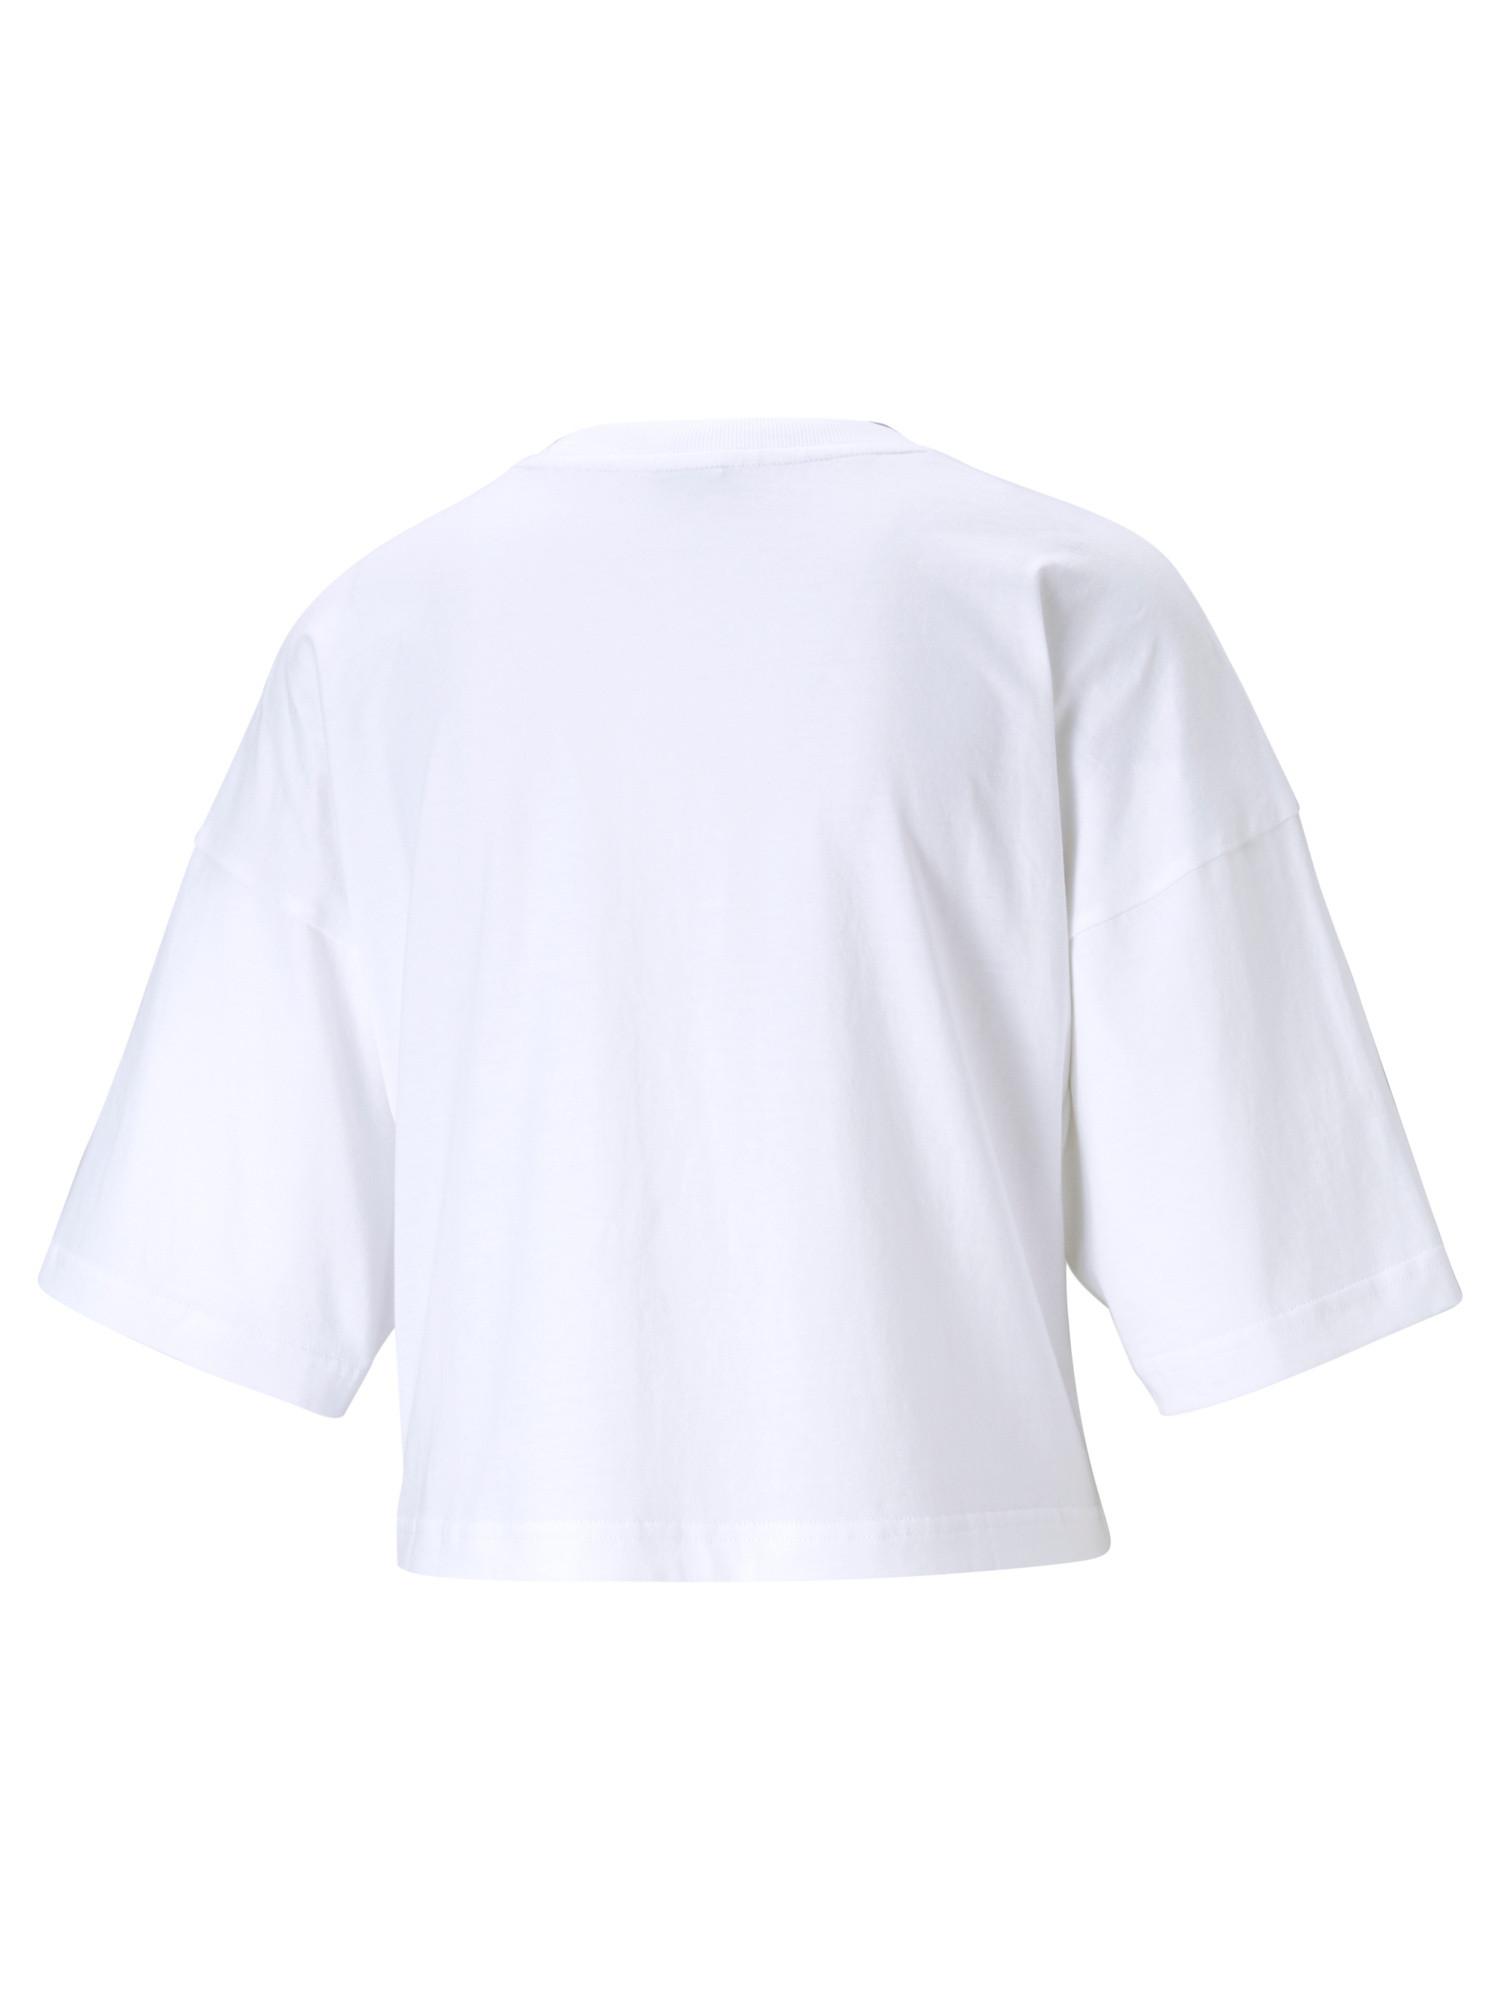 T-shirt donna, Multicolor, large image number 1